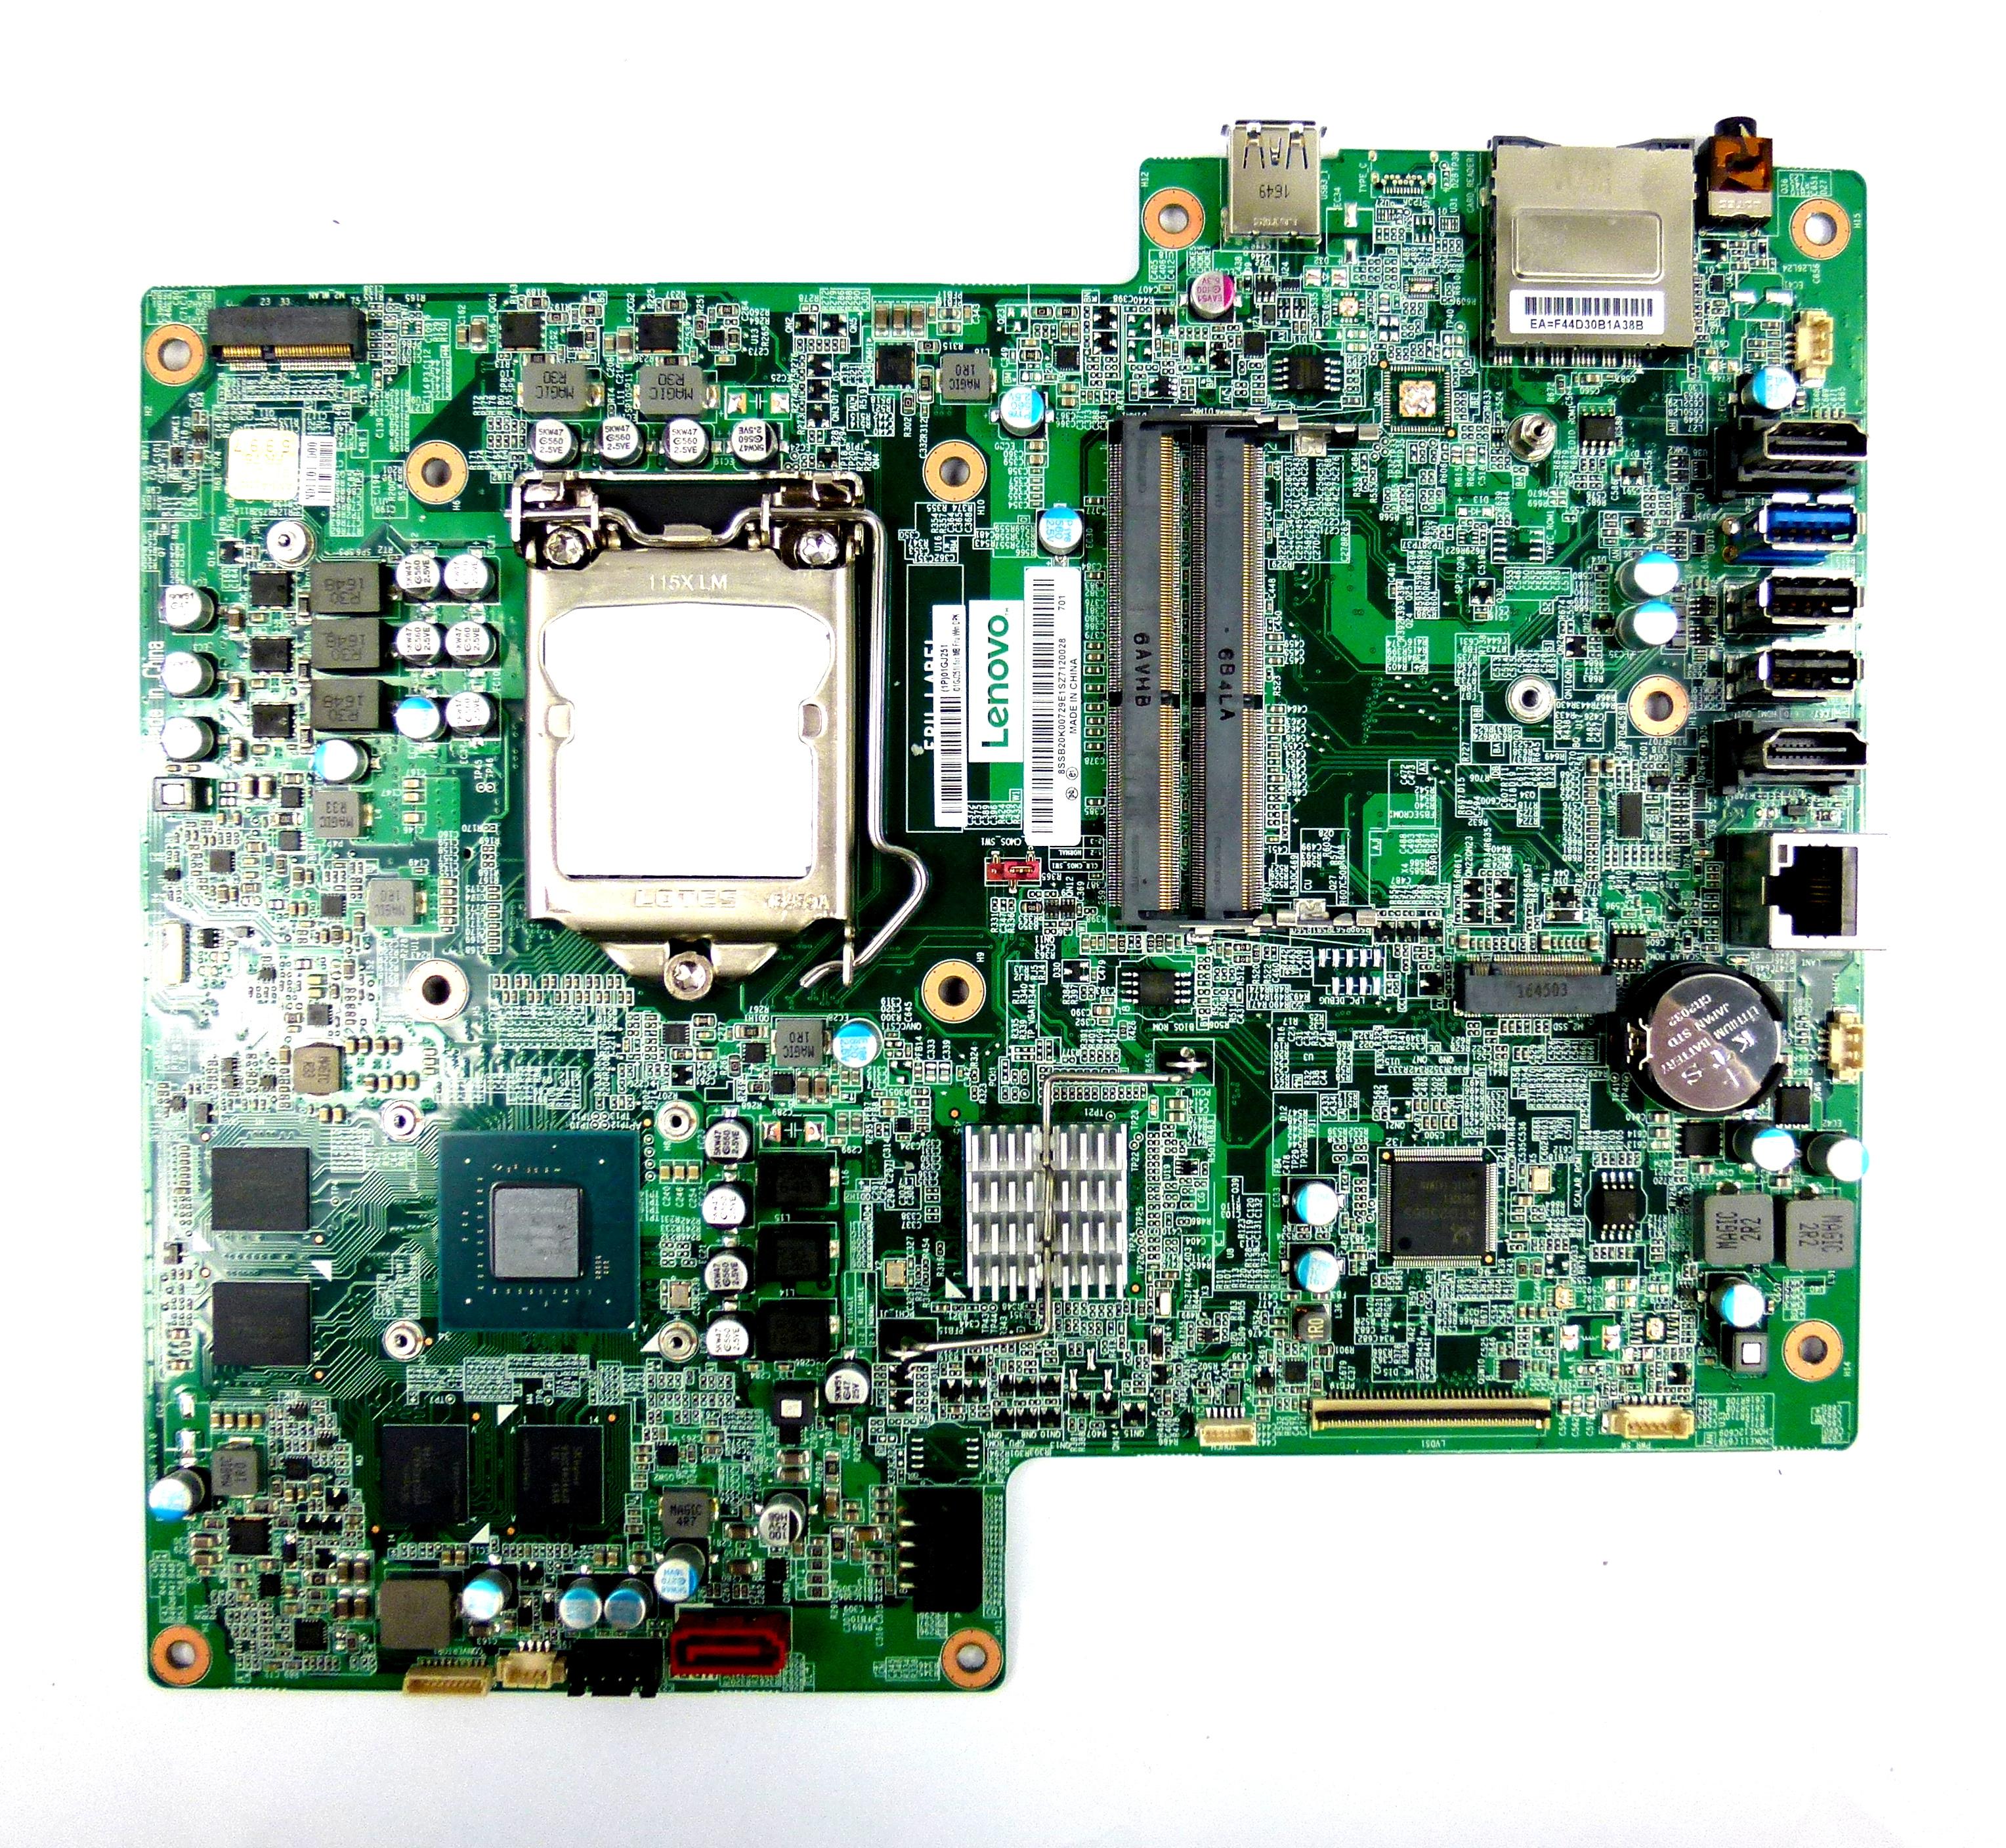 01GJ251 Lenovo IdeaCentre 720-24IKB AiO Motherboard - B250H4-LAI02 V:1.0